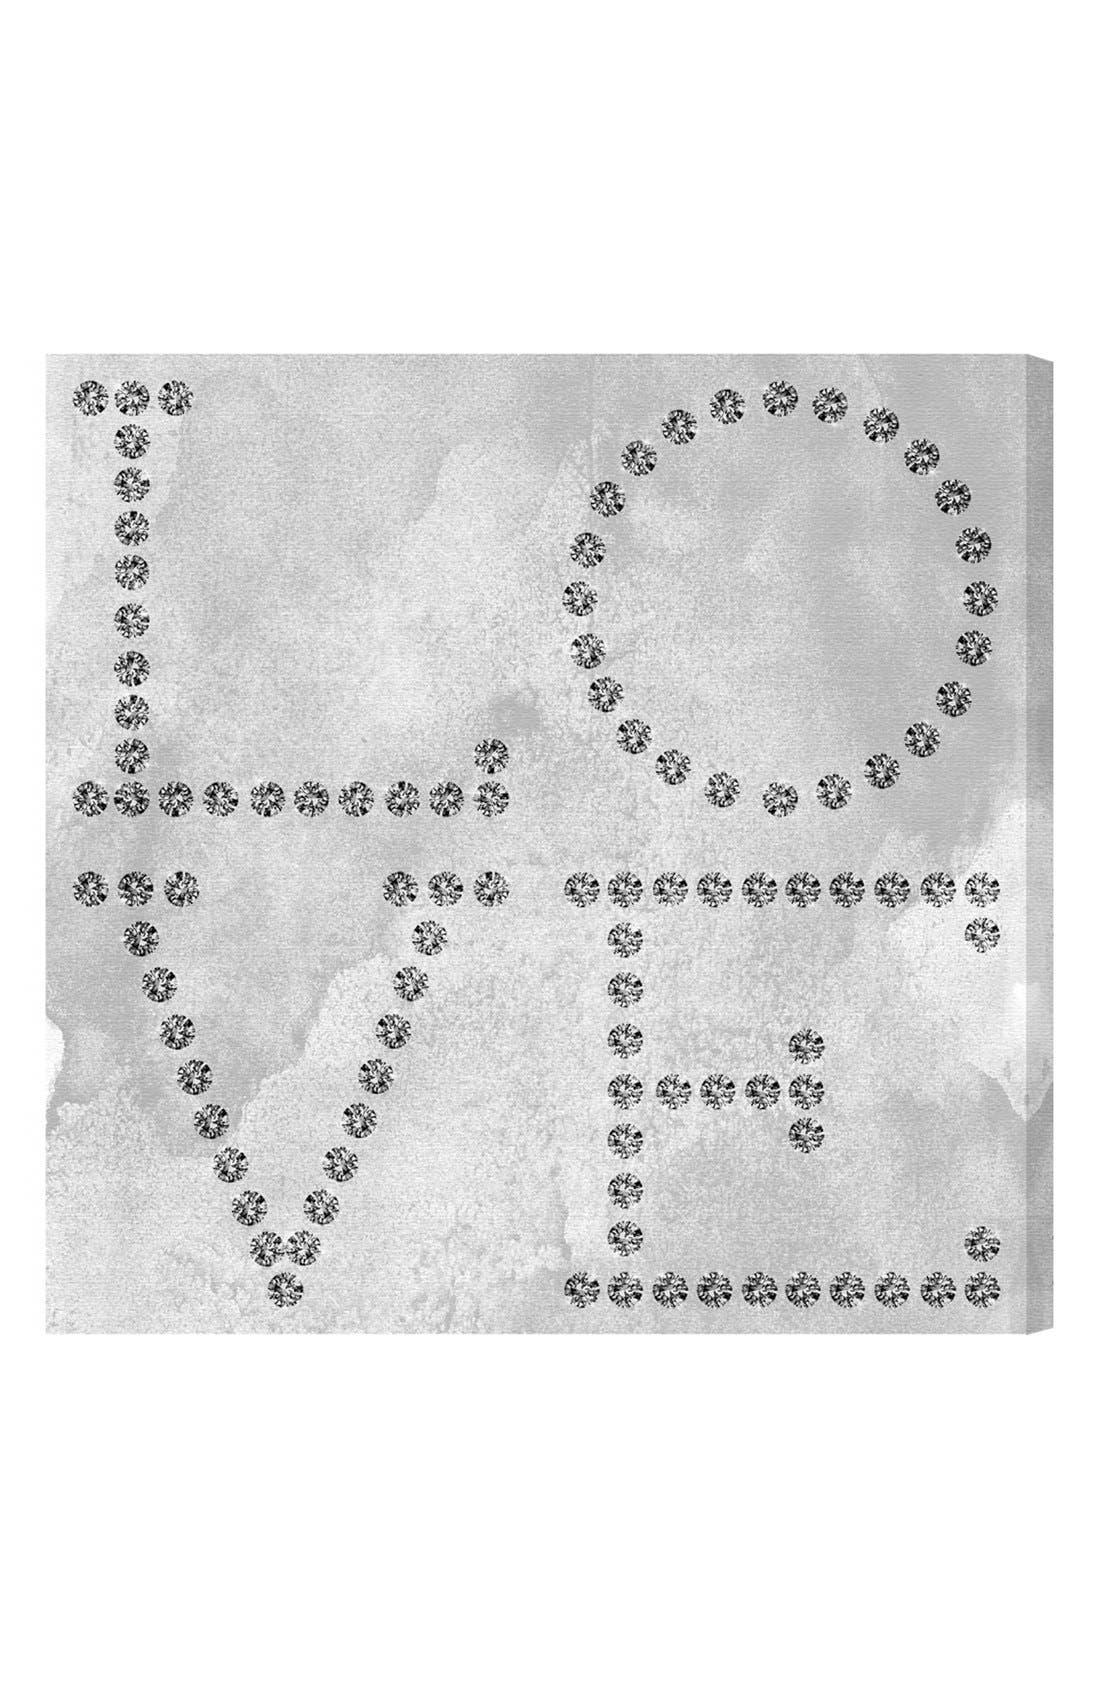 Oliver Gal 'Love Diamonds' Wall Art